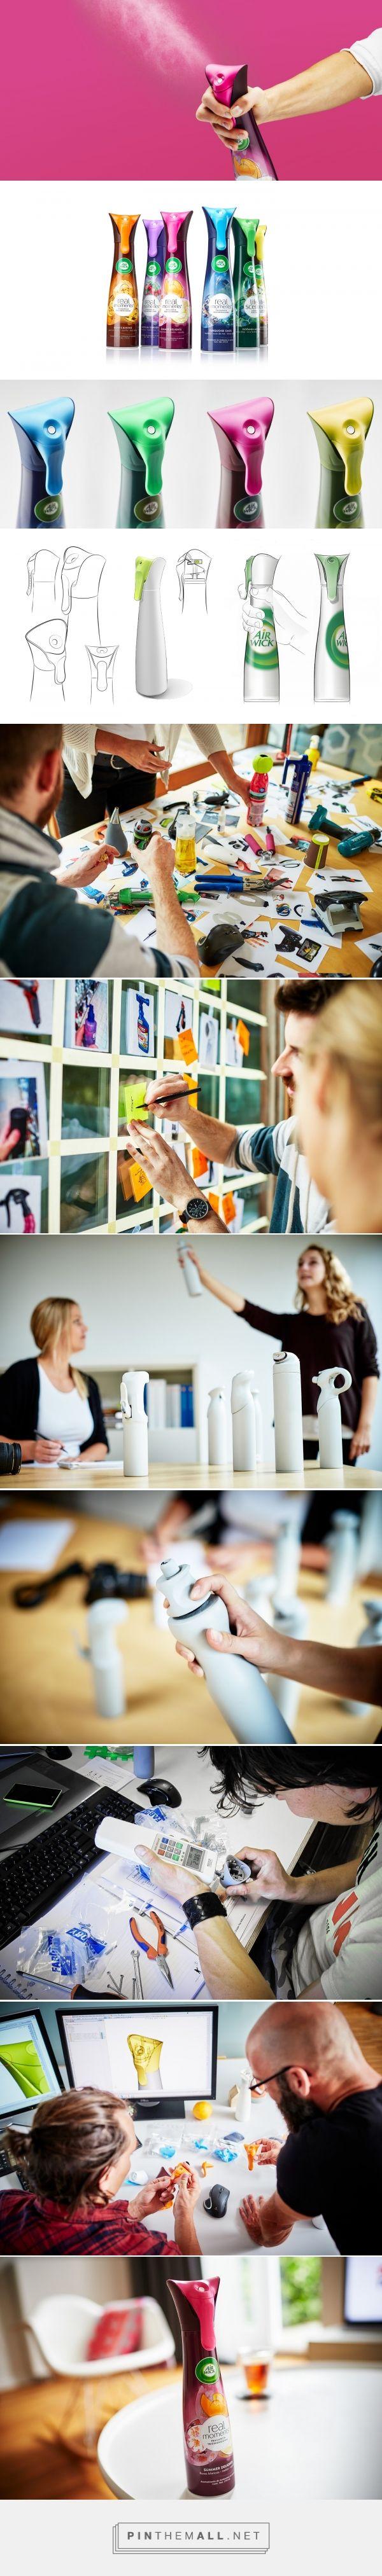 Airwick Life Scents Room Spray packaging#design by VanBerlo Design - https://www.packagingoftheworld.com/2018/03/airwick-life-scents-room-spray.html